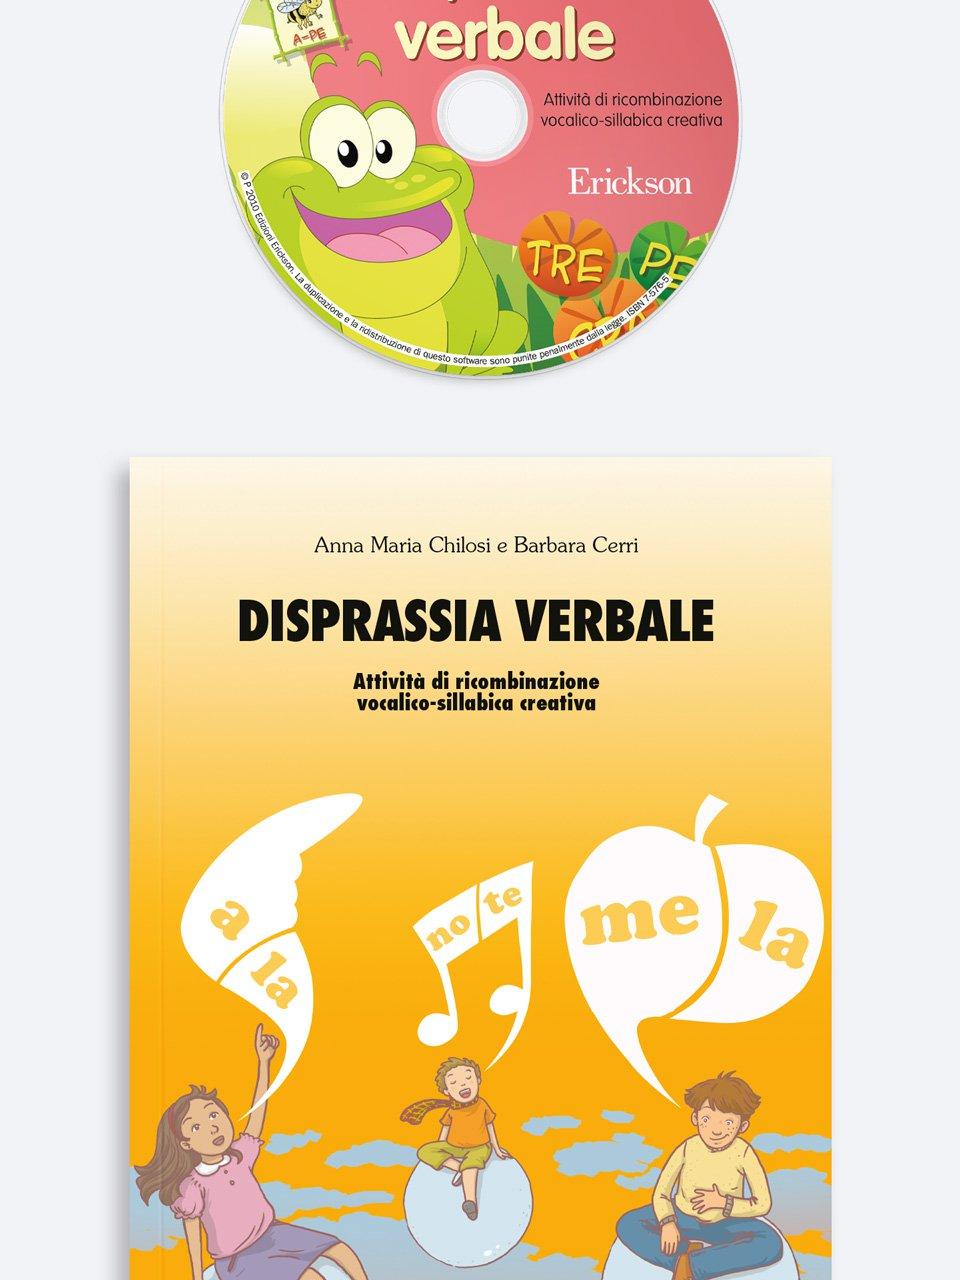 Disprassia verbale - Tachistoscopio SUITE - App e software - Erickson 3